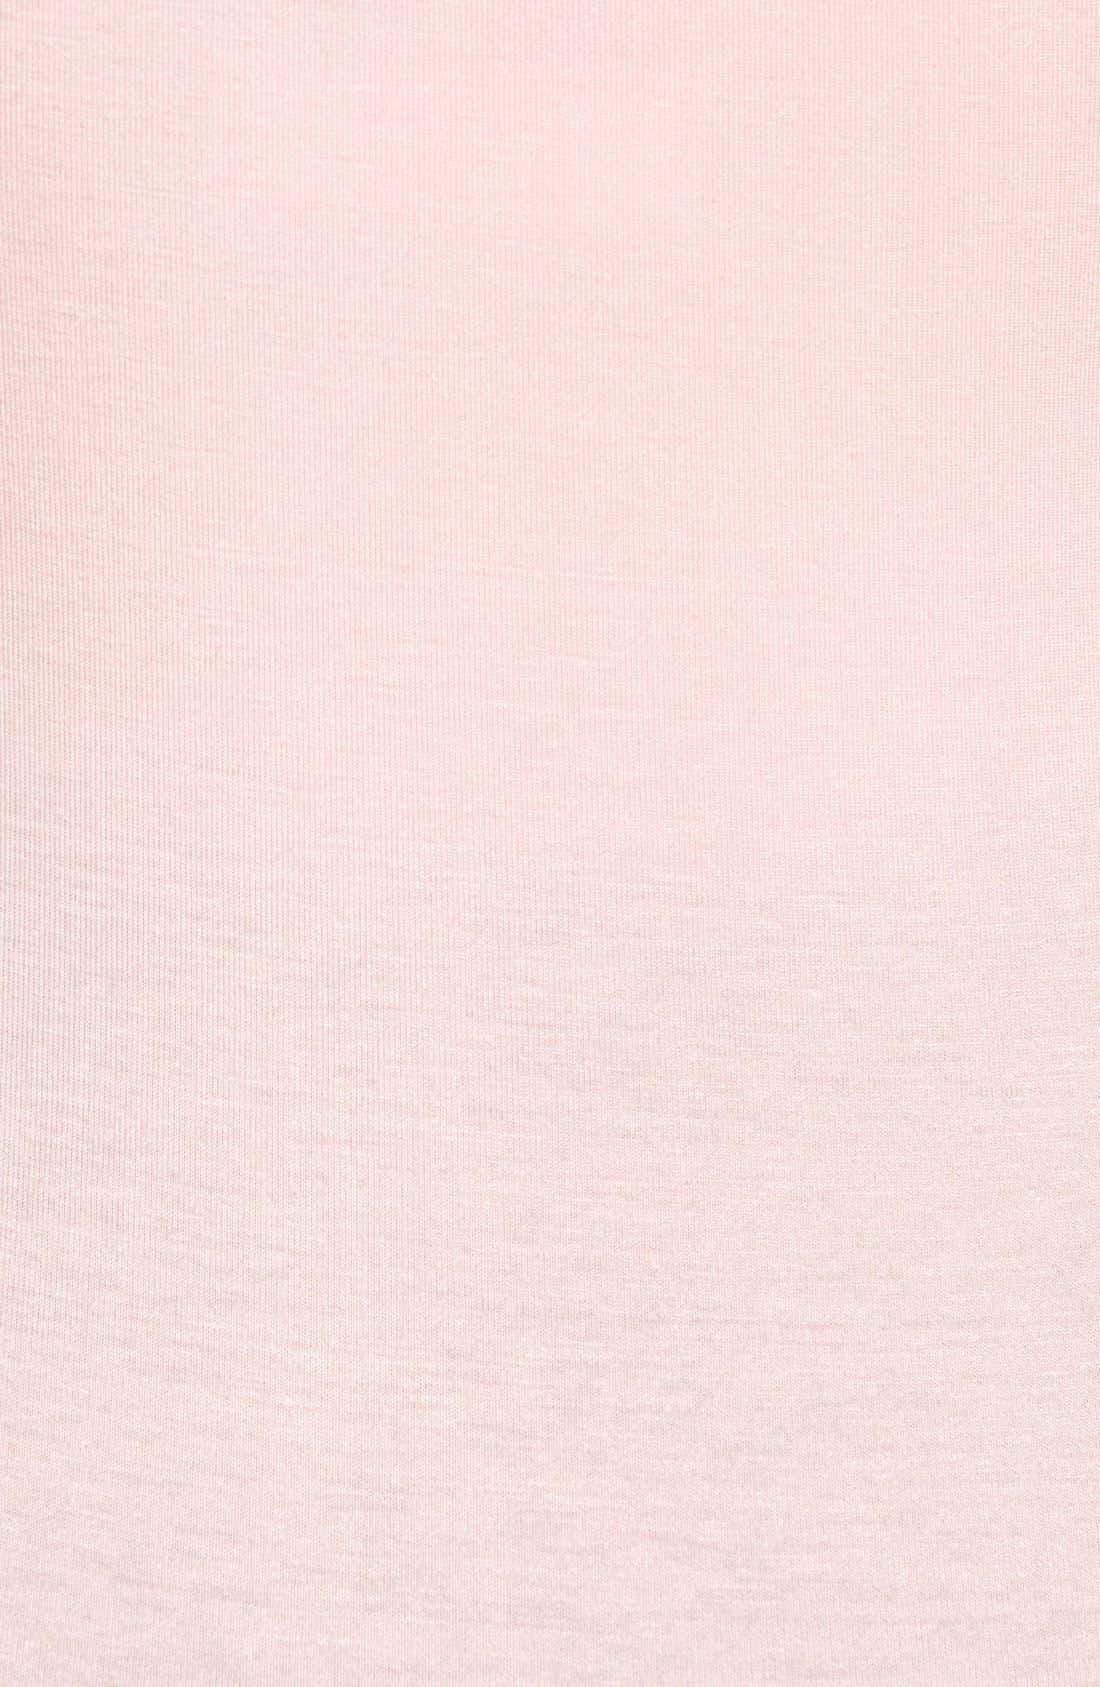 LAB40,                             'Poppy' Maternity/Nursing Top,                             Alternate thumbnail 5, color,                             650